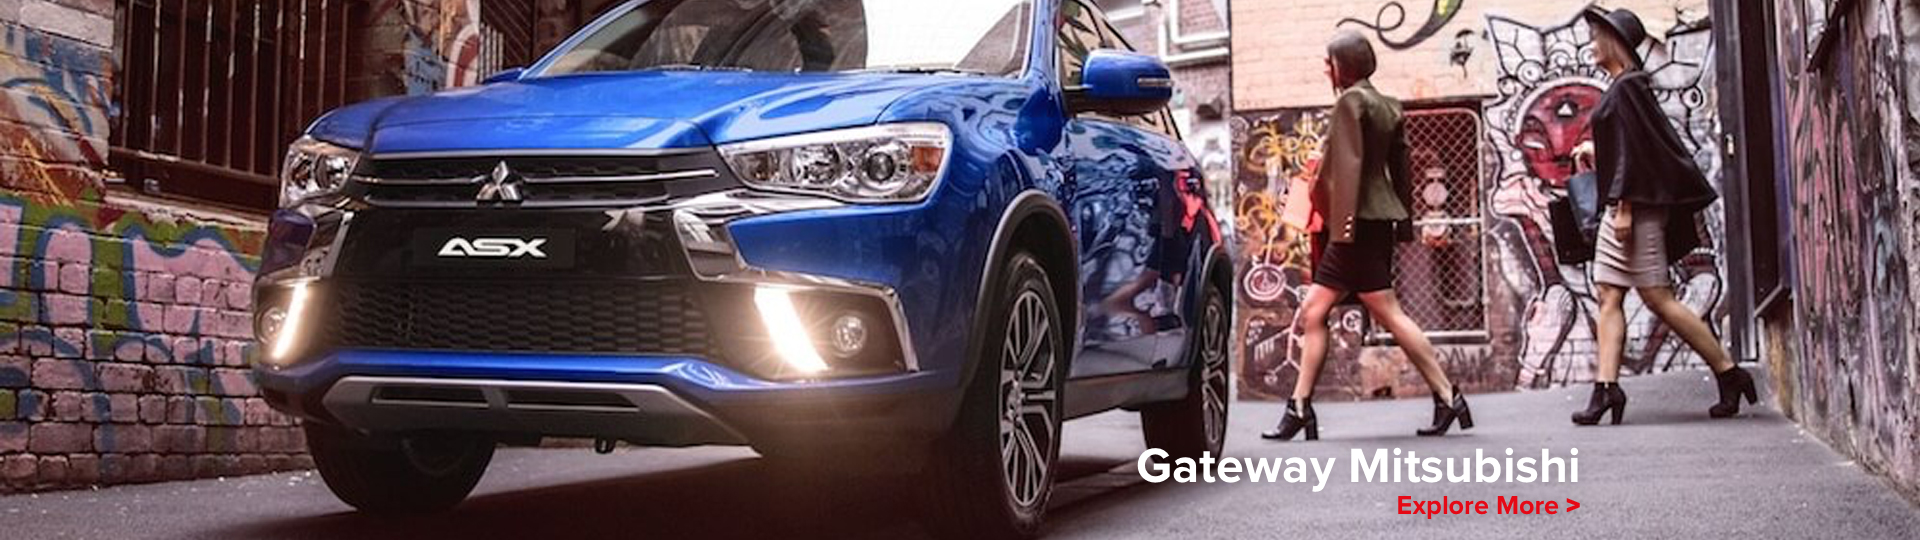 Ford, Holden, HSV, Kia, Mitsubishi & Renault Dealer Wollongong ...